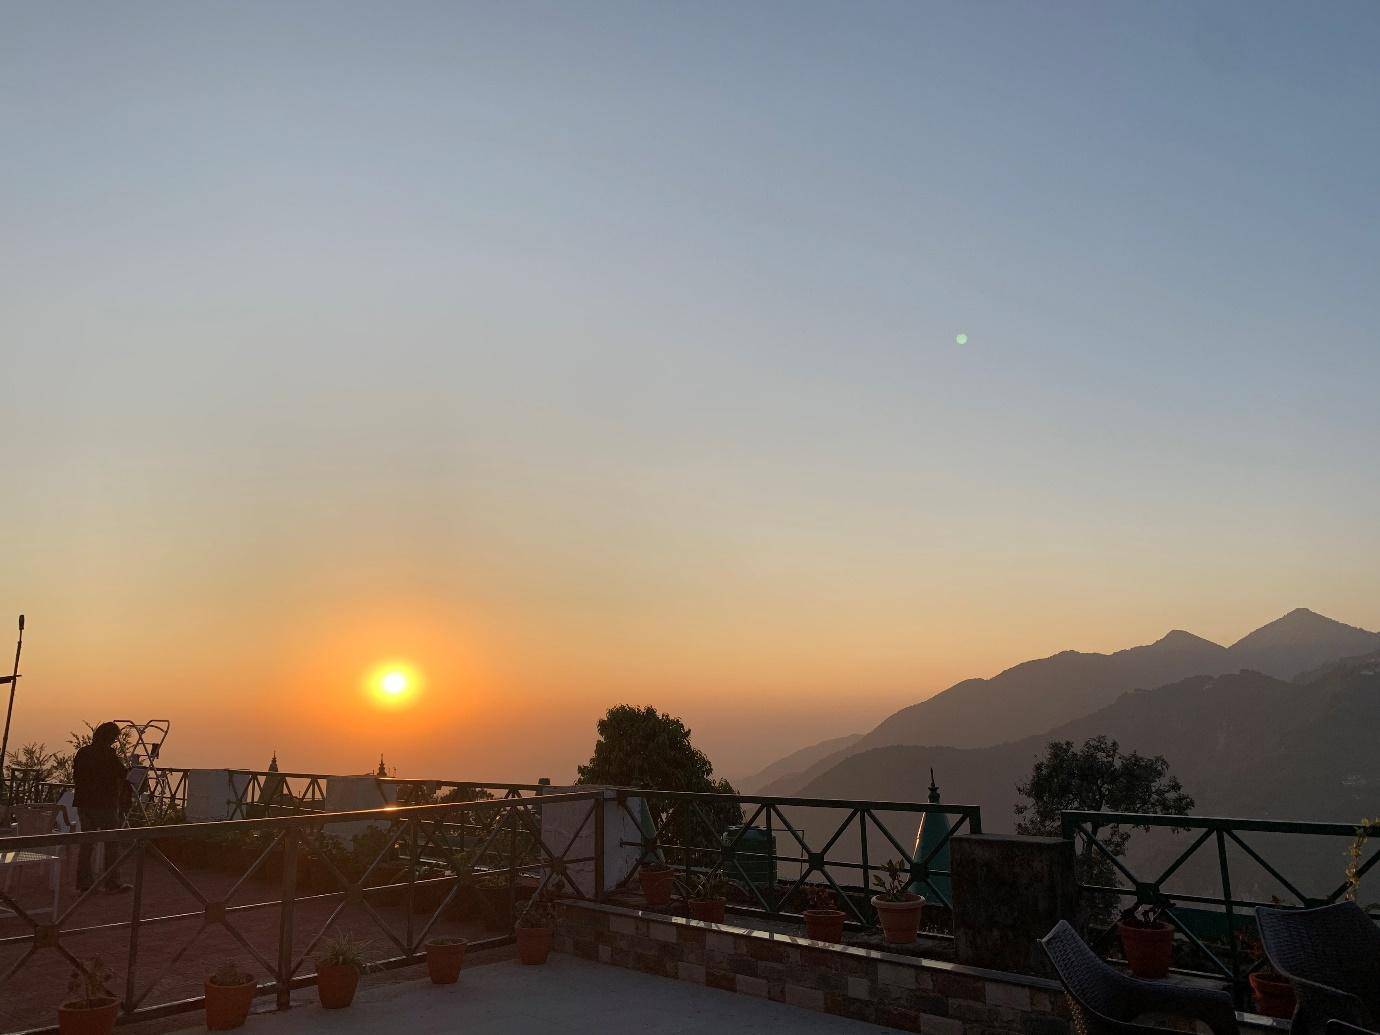 sunset travelling